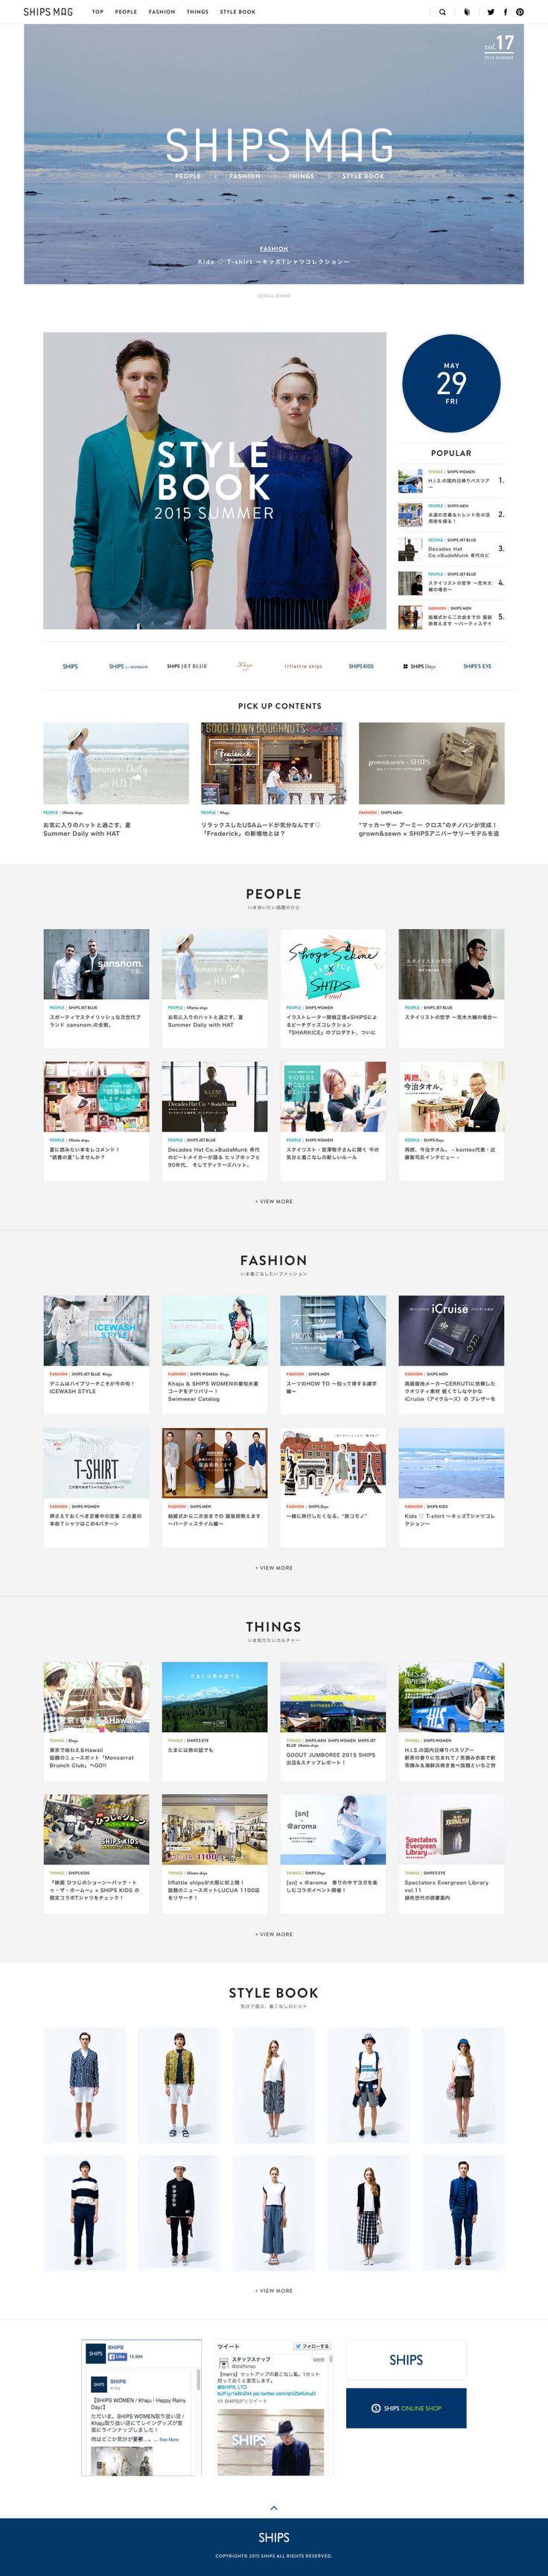 SHIPS MAG   Grids   Web/グラフィック(紙)デザインのリンク集・ポータルサイト